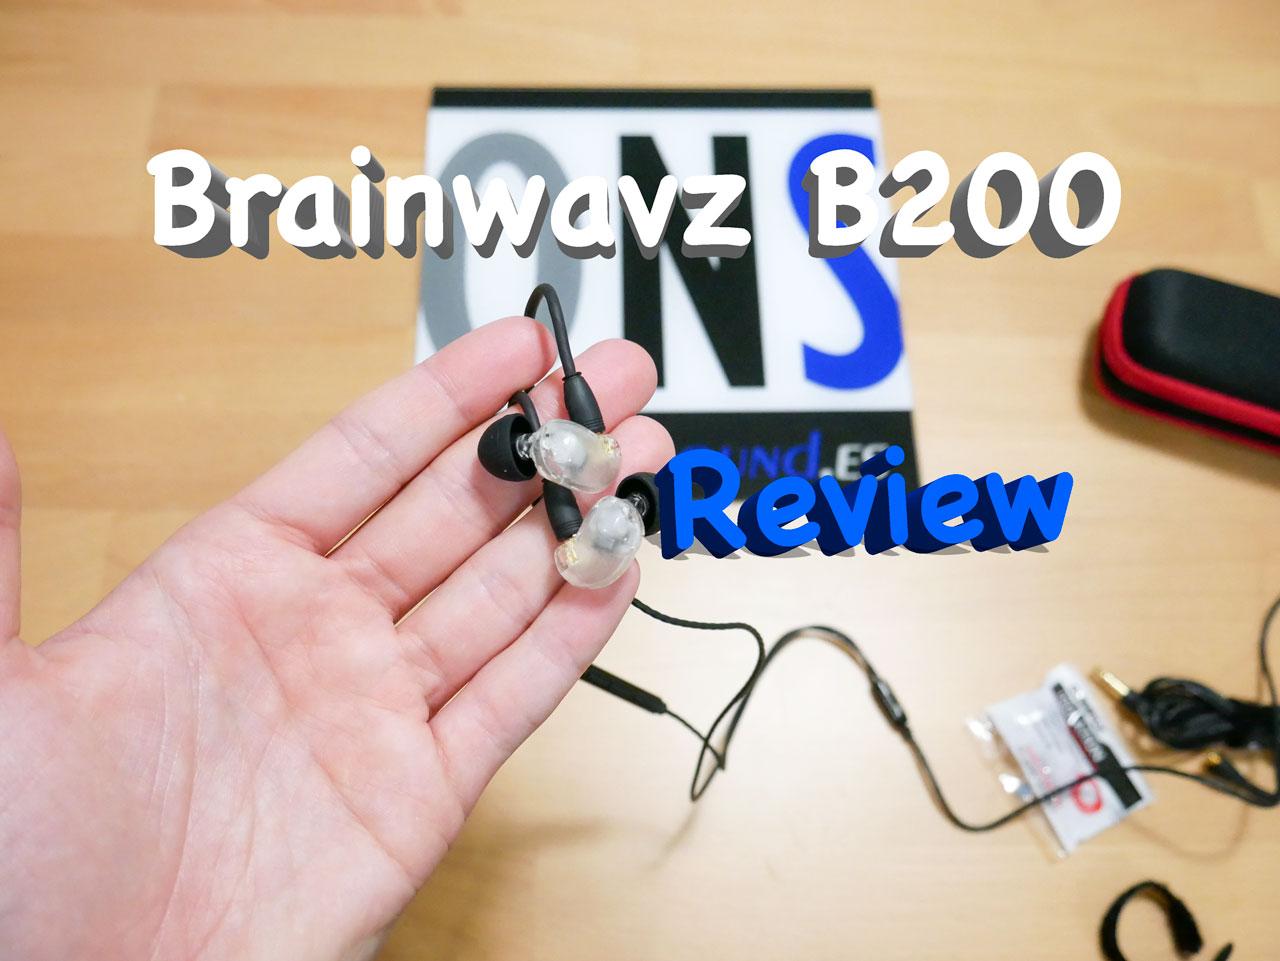 Brainvawz B200 Vídeo-Review